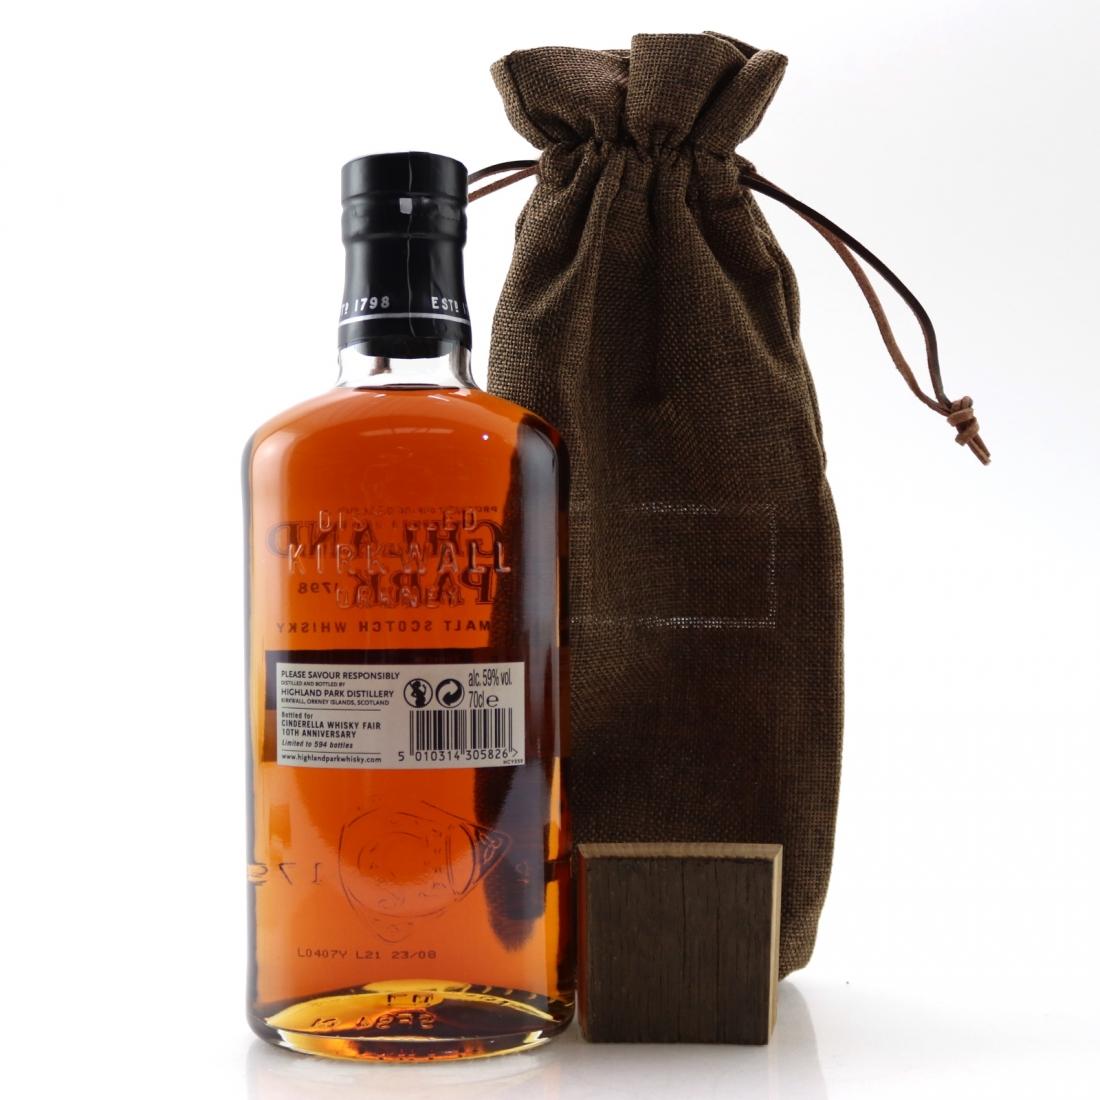 Highland Park 2003 Single Cask 14 Year Old #3824 / Cinderella Whisky Fair 10th Anniversary